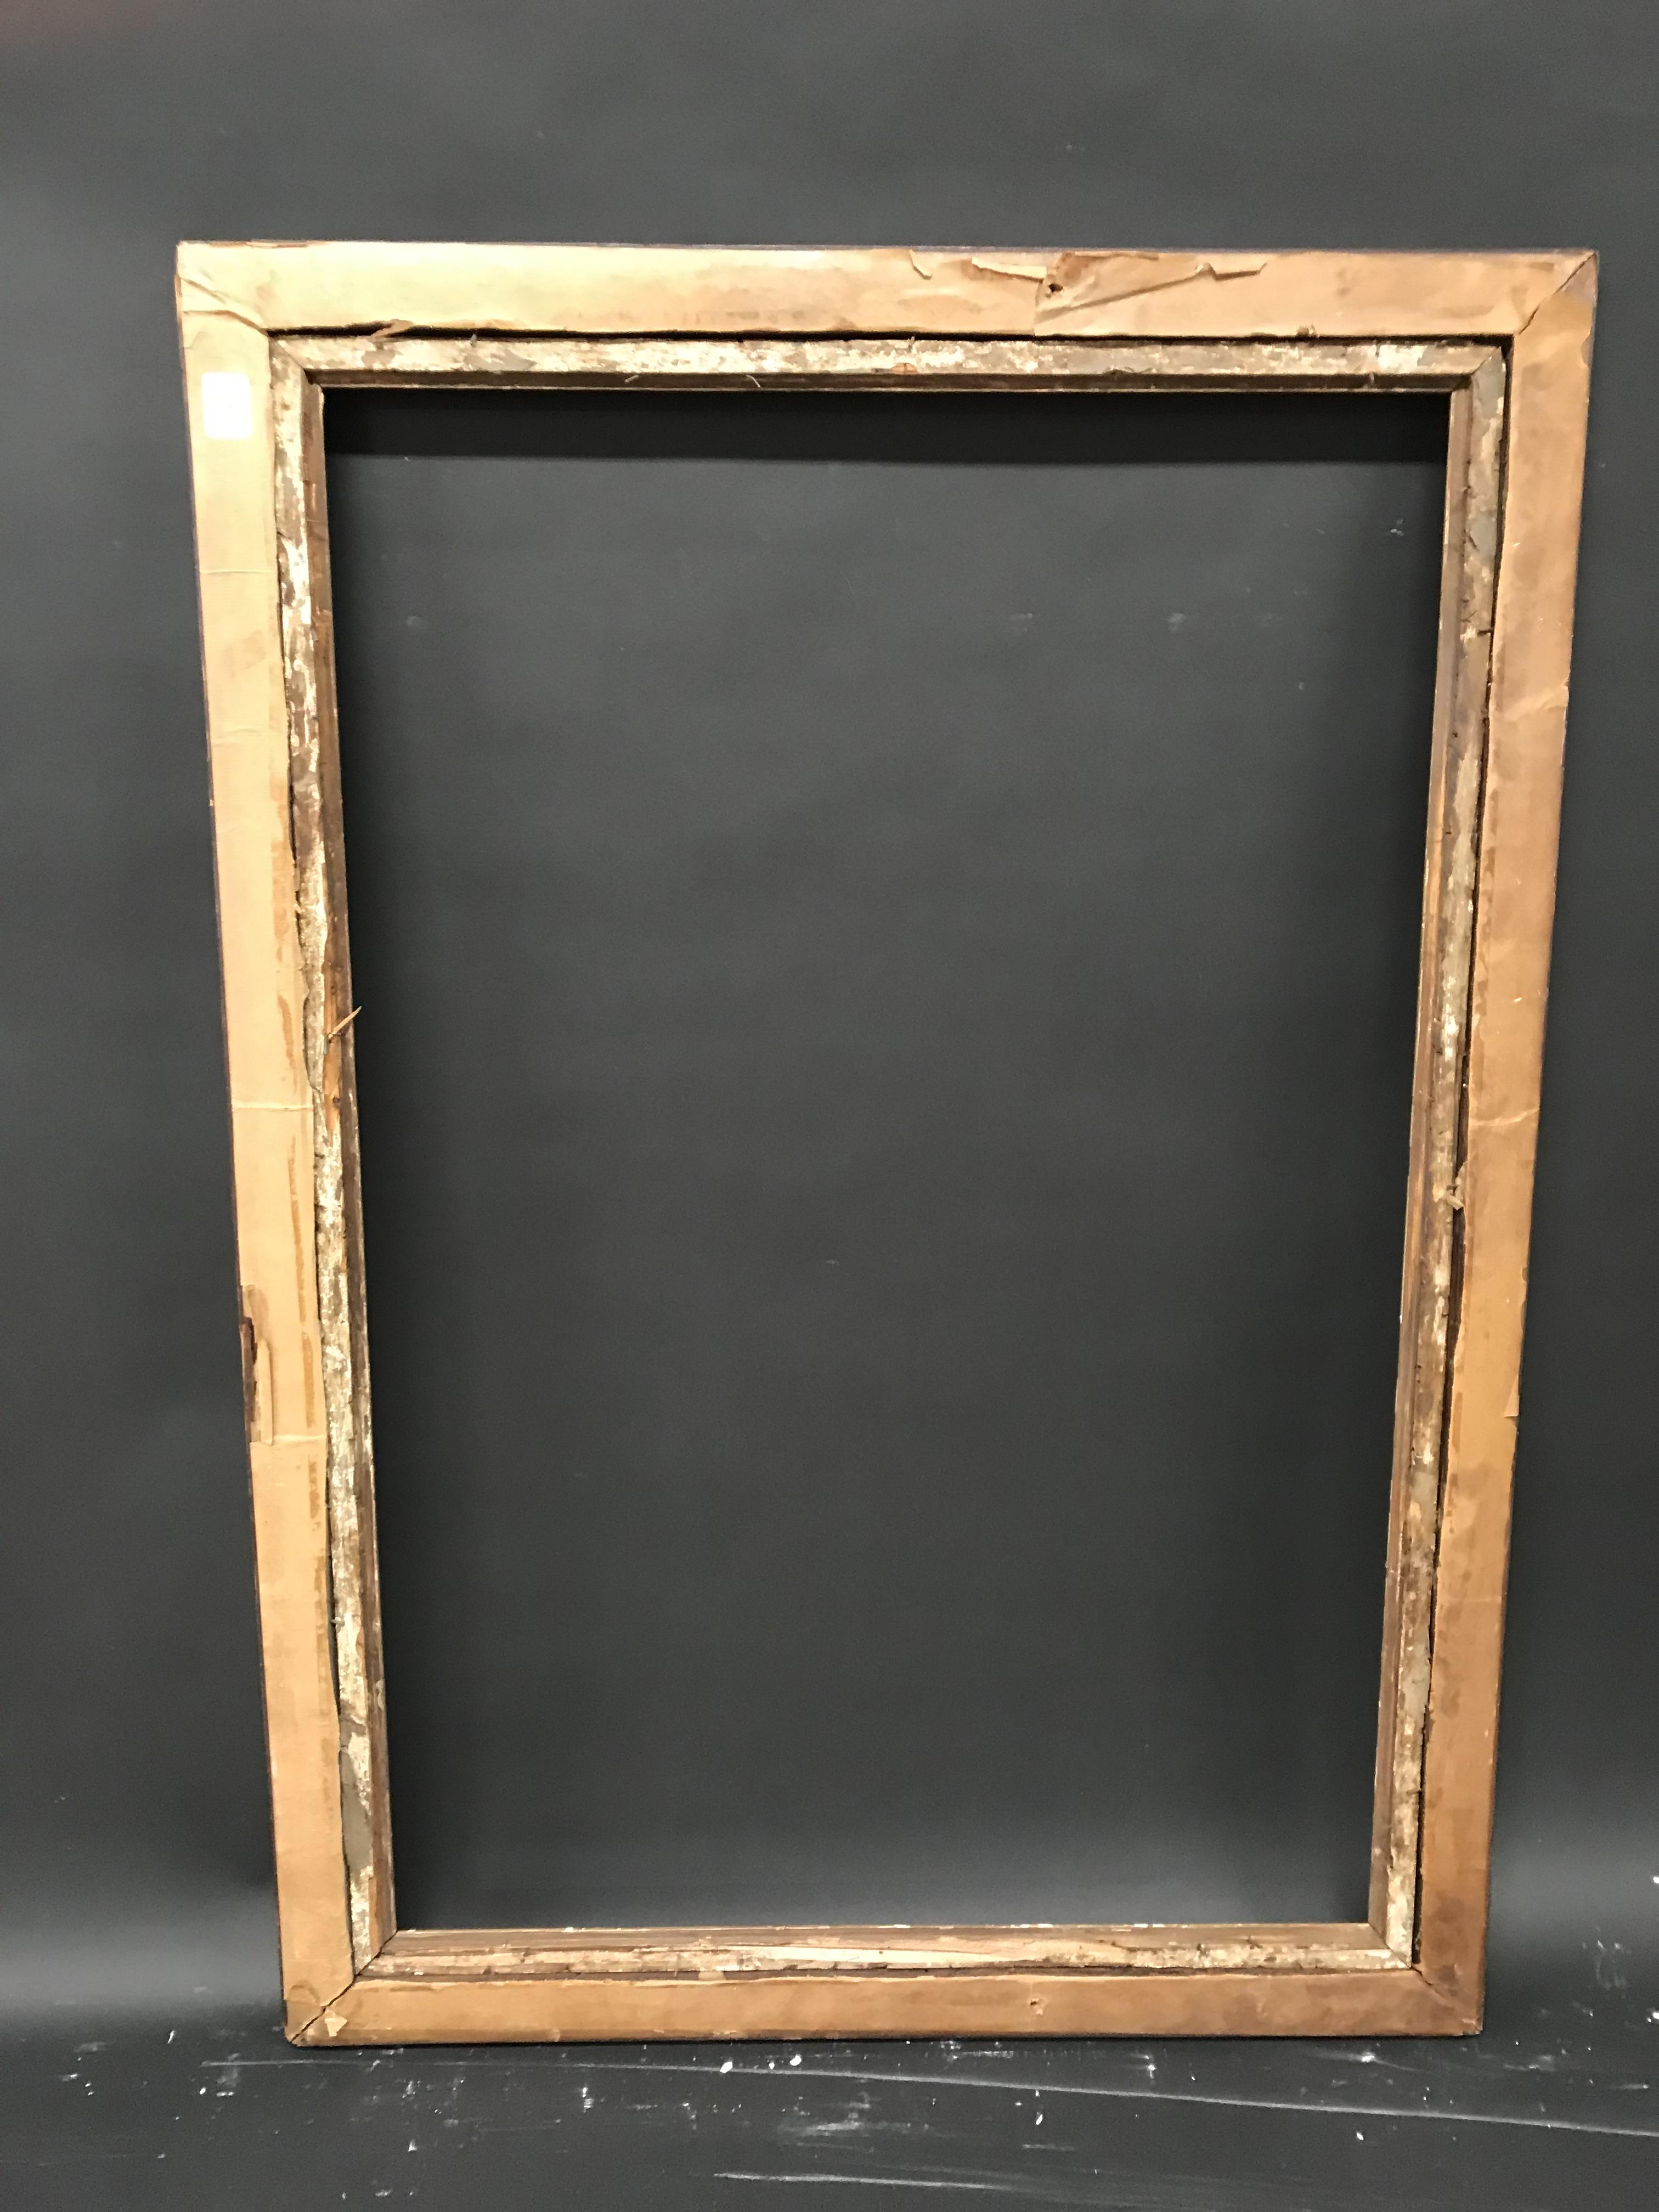 "Lot 24 - 19th Century English School. A Birdseye Maple Frame, with a Gilt Slip, 36.25"" x 24.5"" (rebate)."